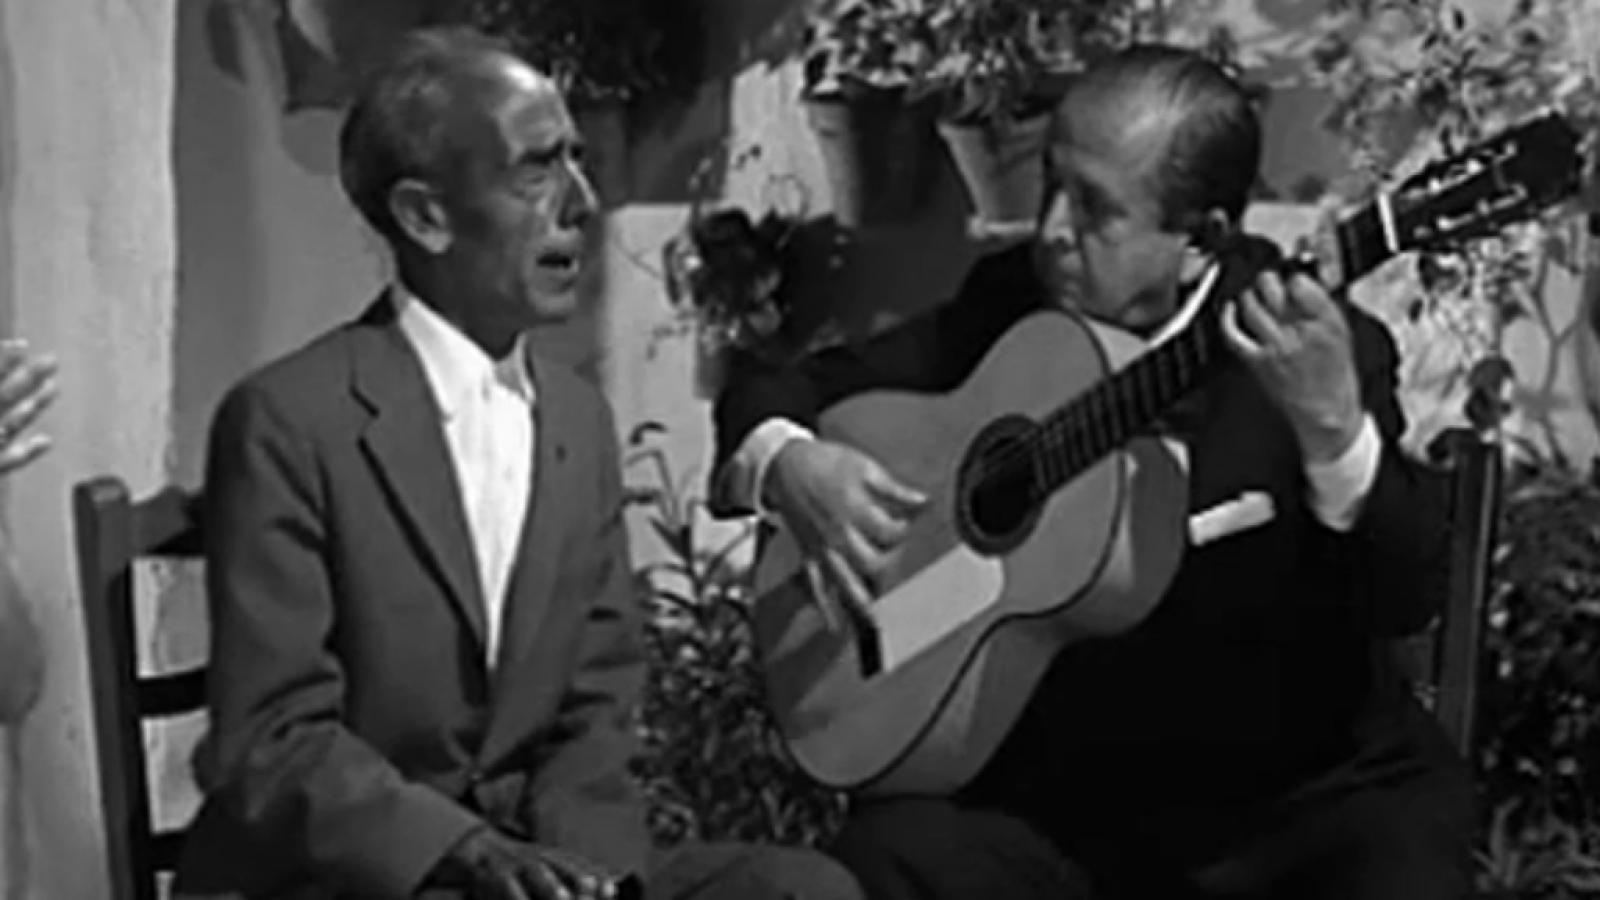 Rito y geografia del cante - Soleares (Parte 1)